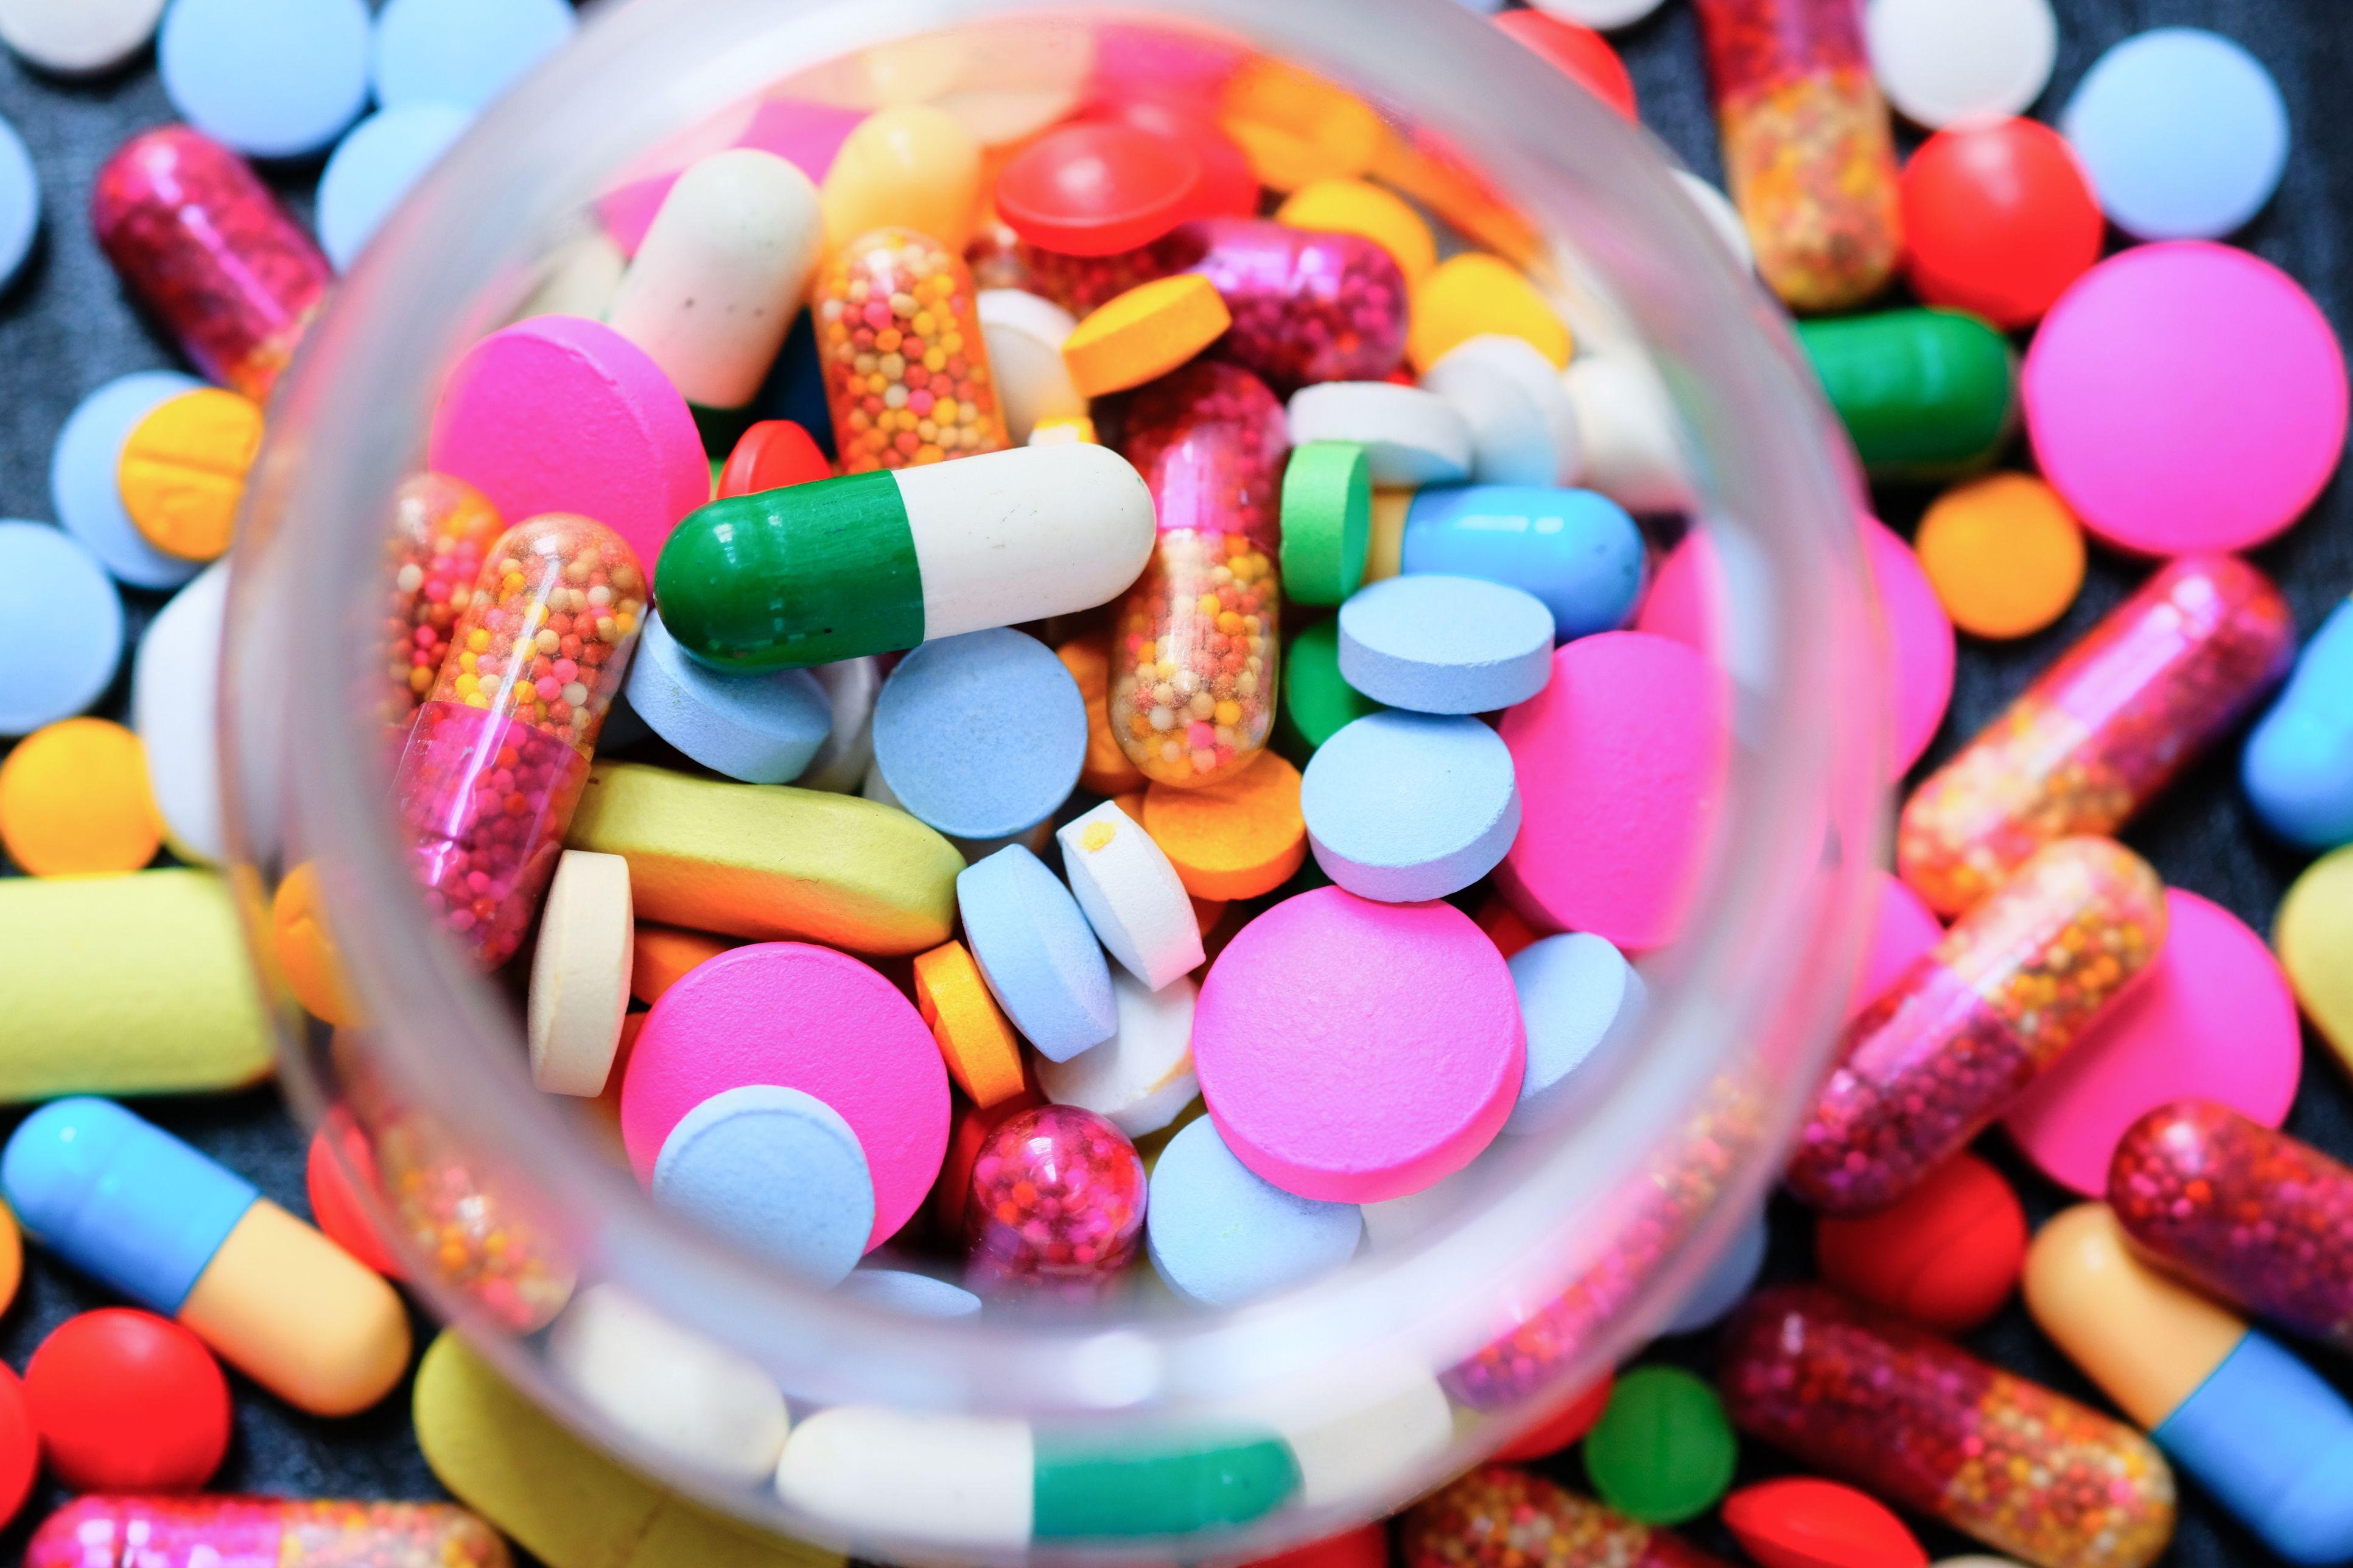 Sexual pill ingredients retail